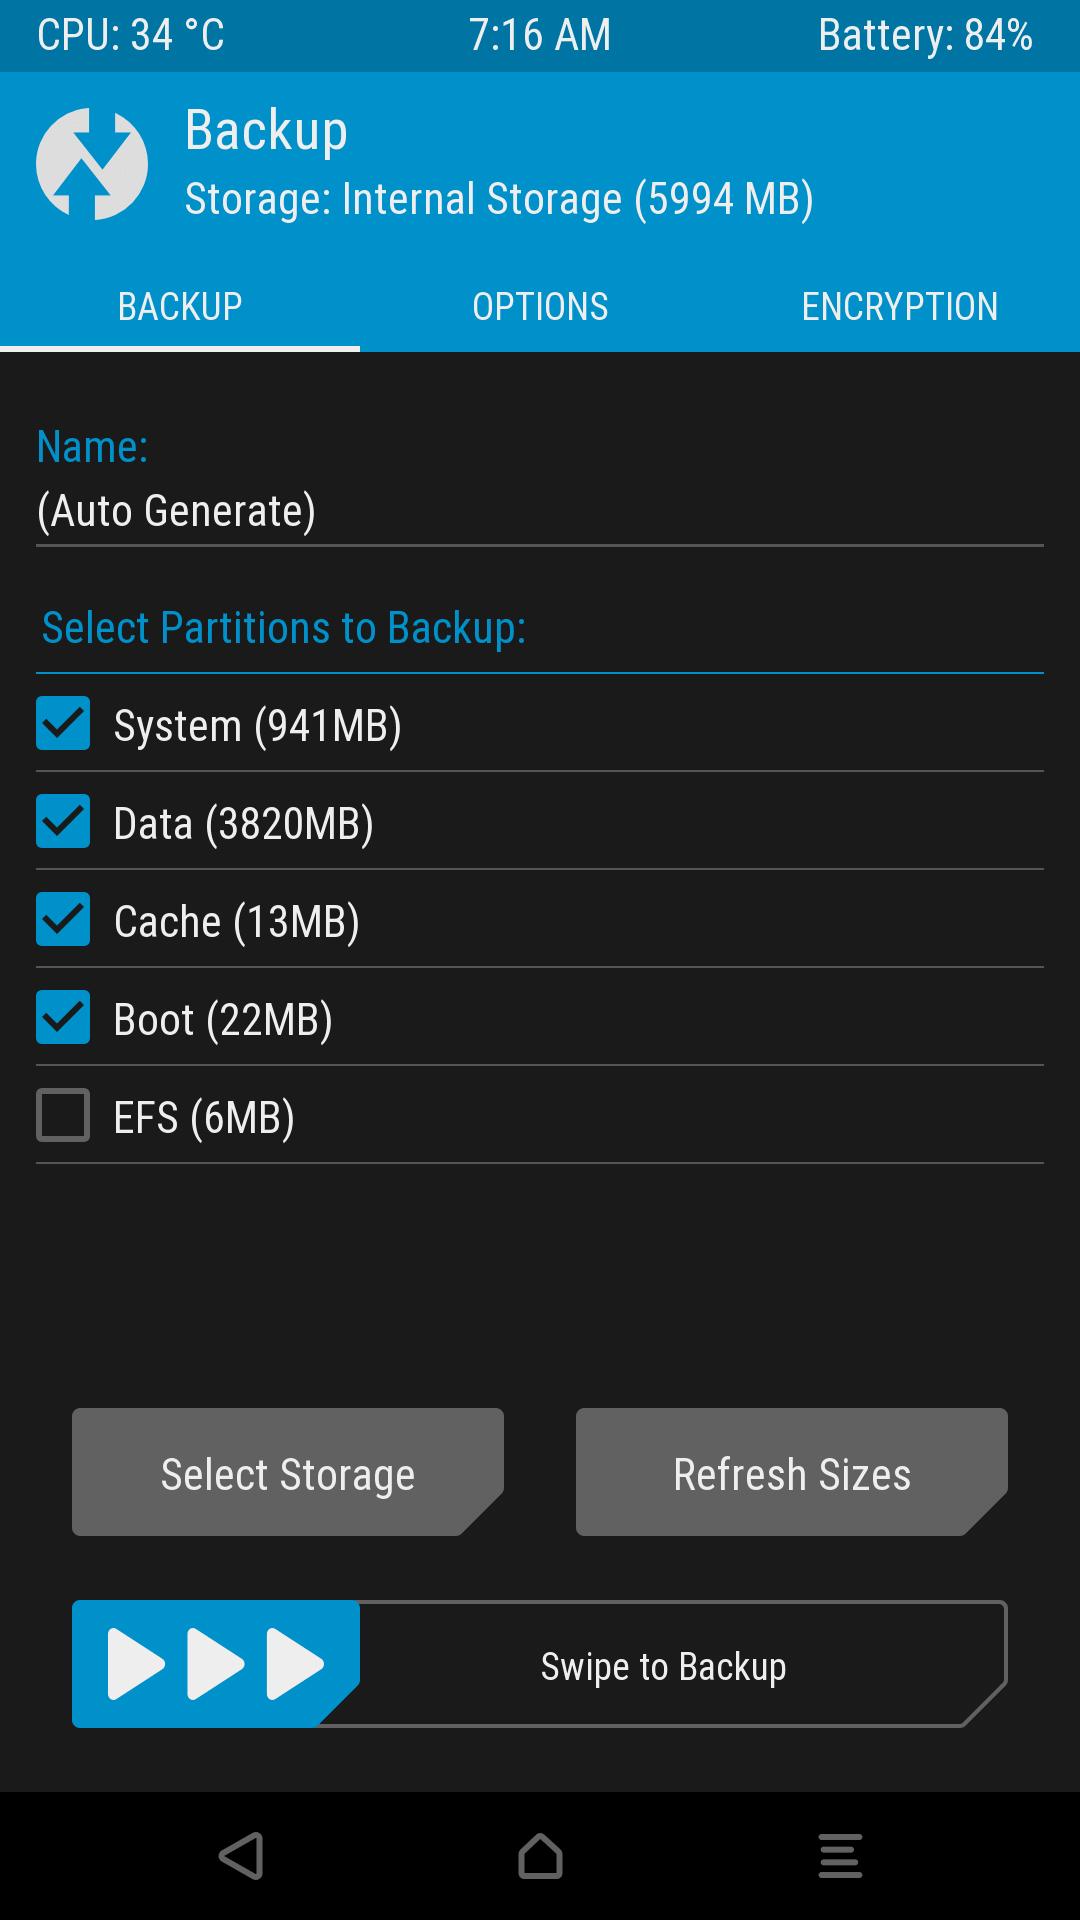 MY MOD V 0.2.ZIP 8 96 МБ ПРОШИВКИ NEXUS PRIMO НА ТЕЛЕФОН HTC ONE V СКАЧАТЬ БЕСПЛАТНО